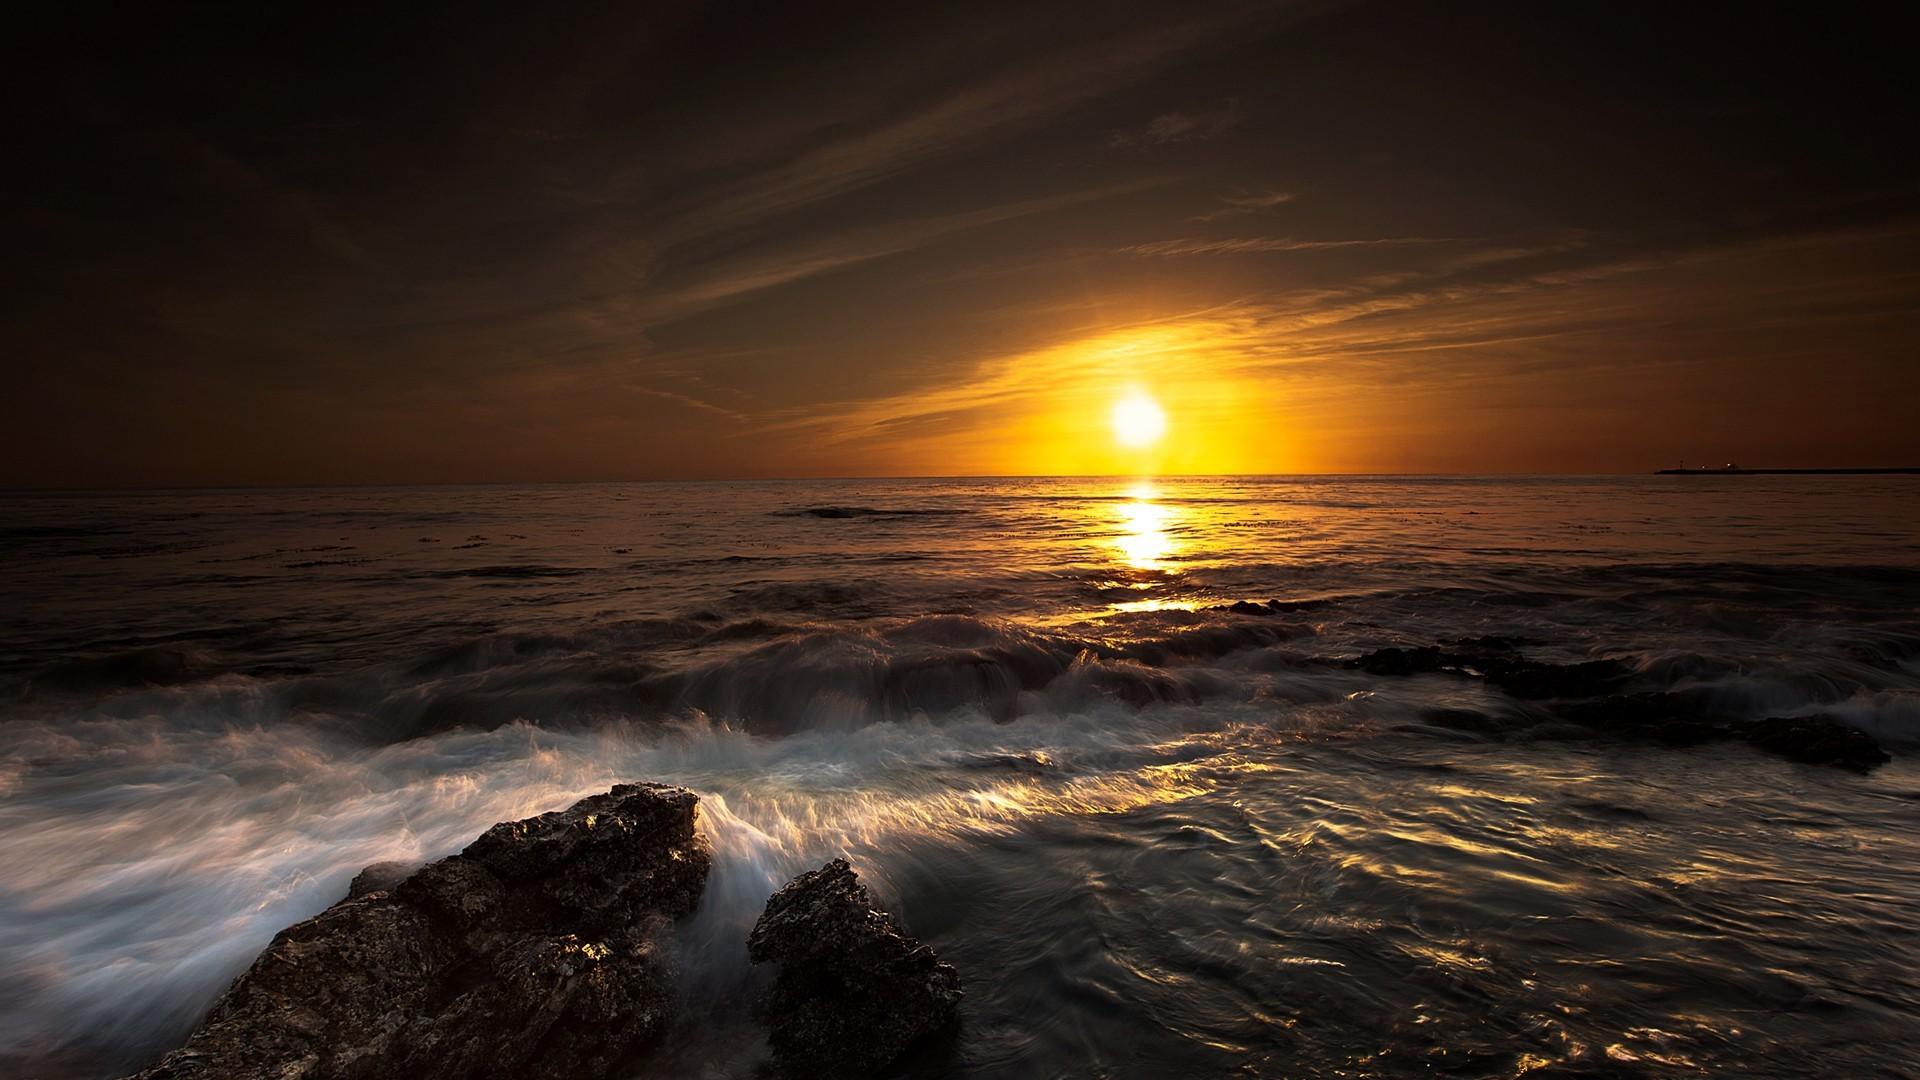 Ocean Sunset wallpaper – 905192